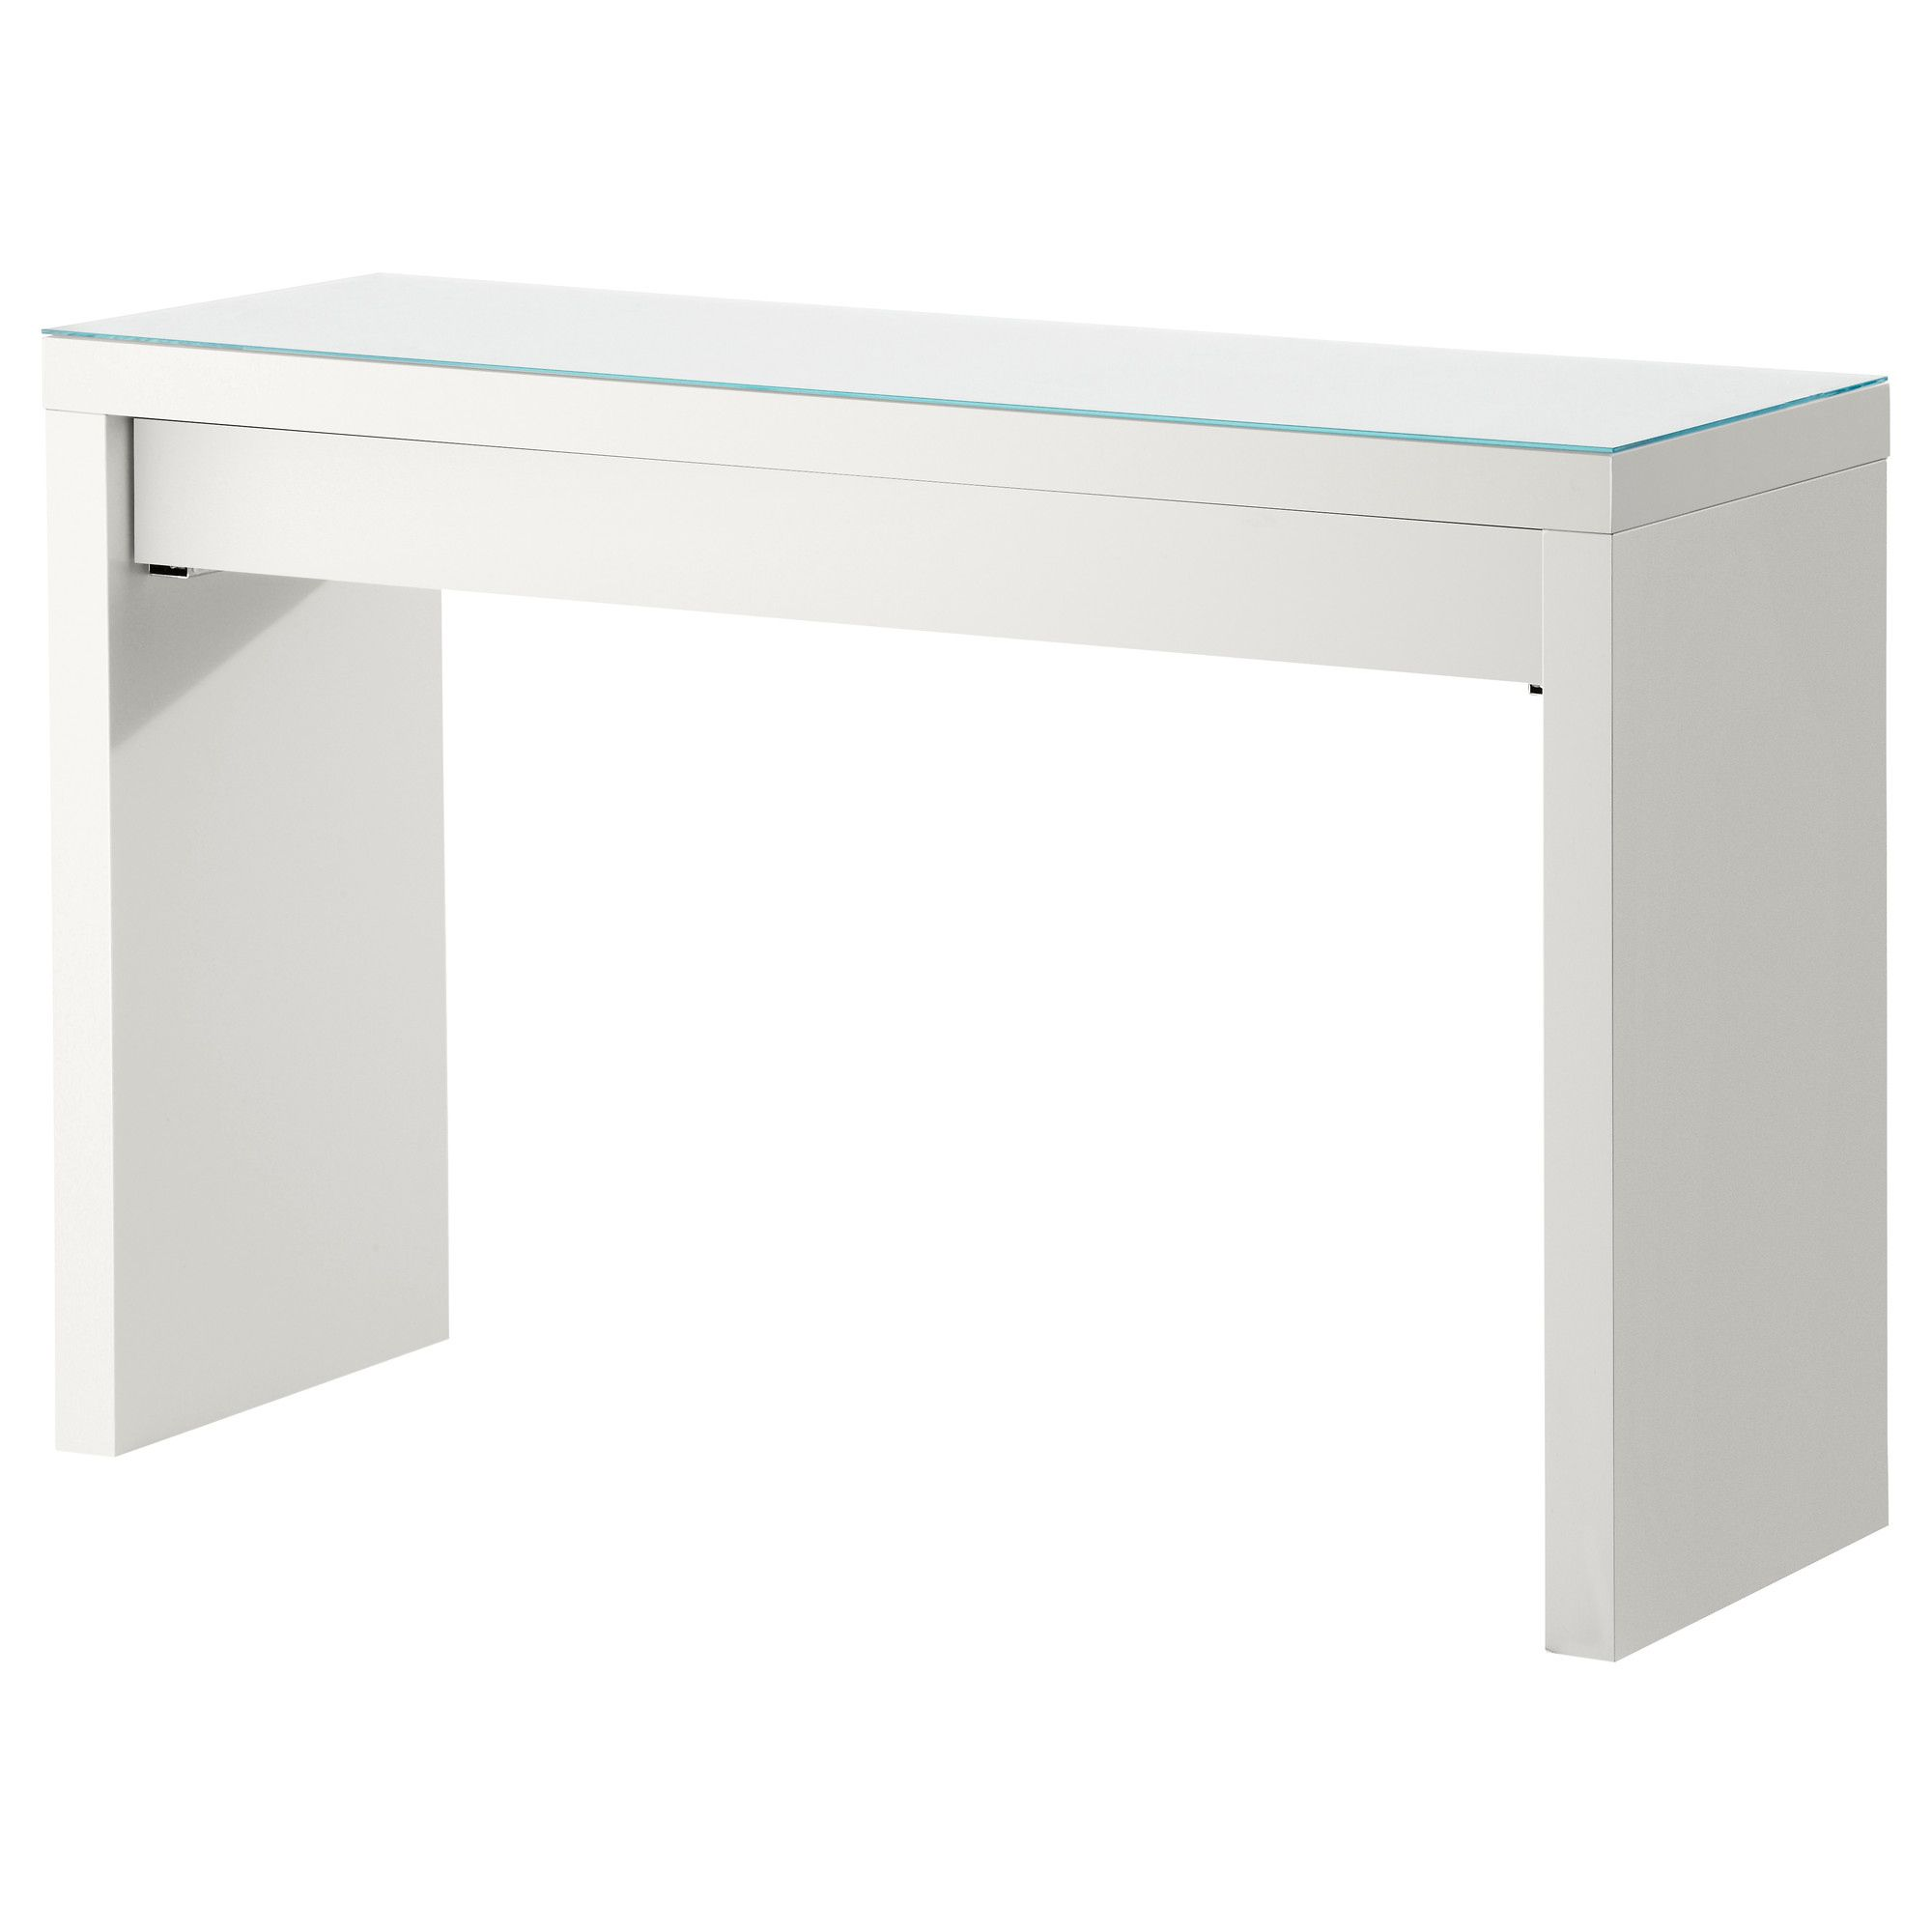 2018 Ikea Desk Glass Top Organization Ideas For Small Desk Check More At Http Michael Mala Ikea Dressing Table Ikea Malm Dressing Table Malm Dressing Table